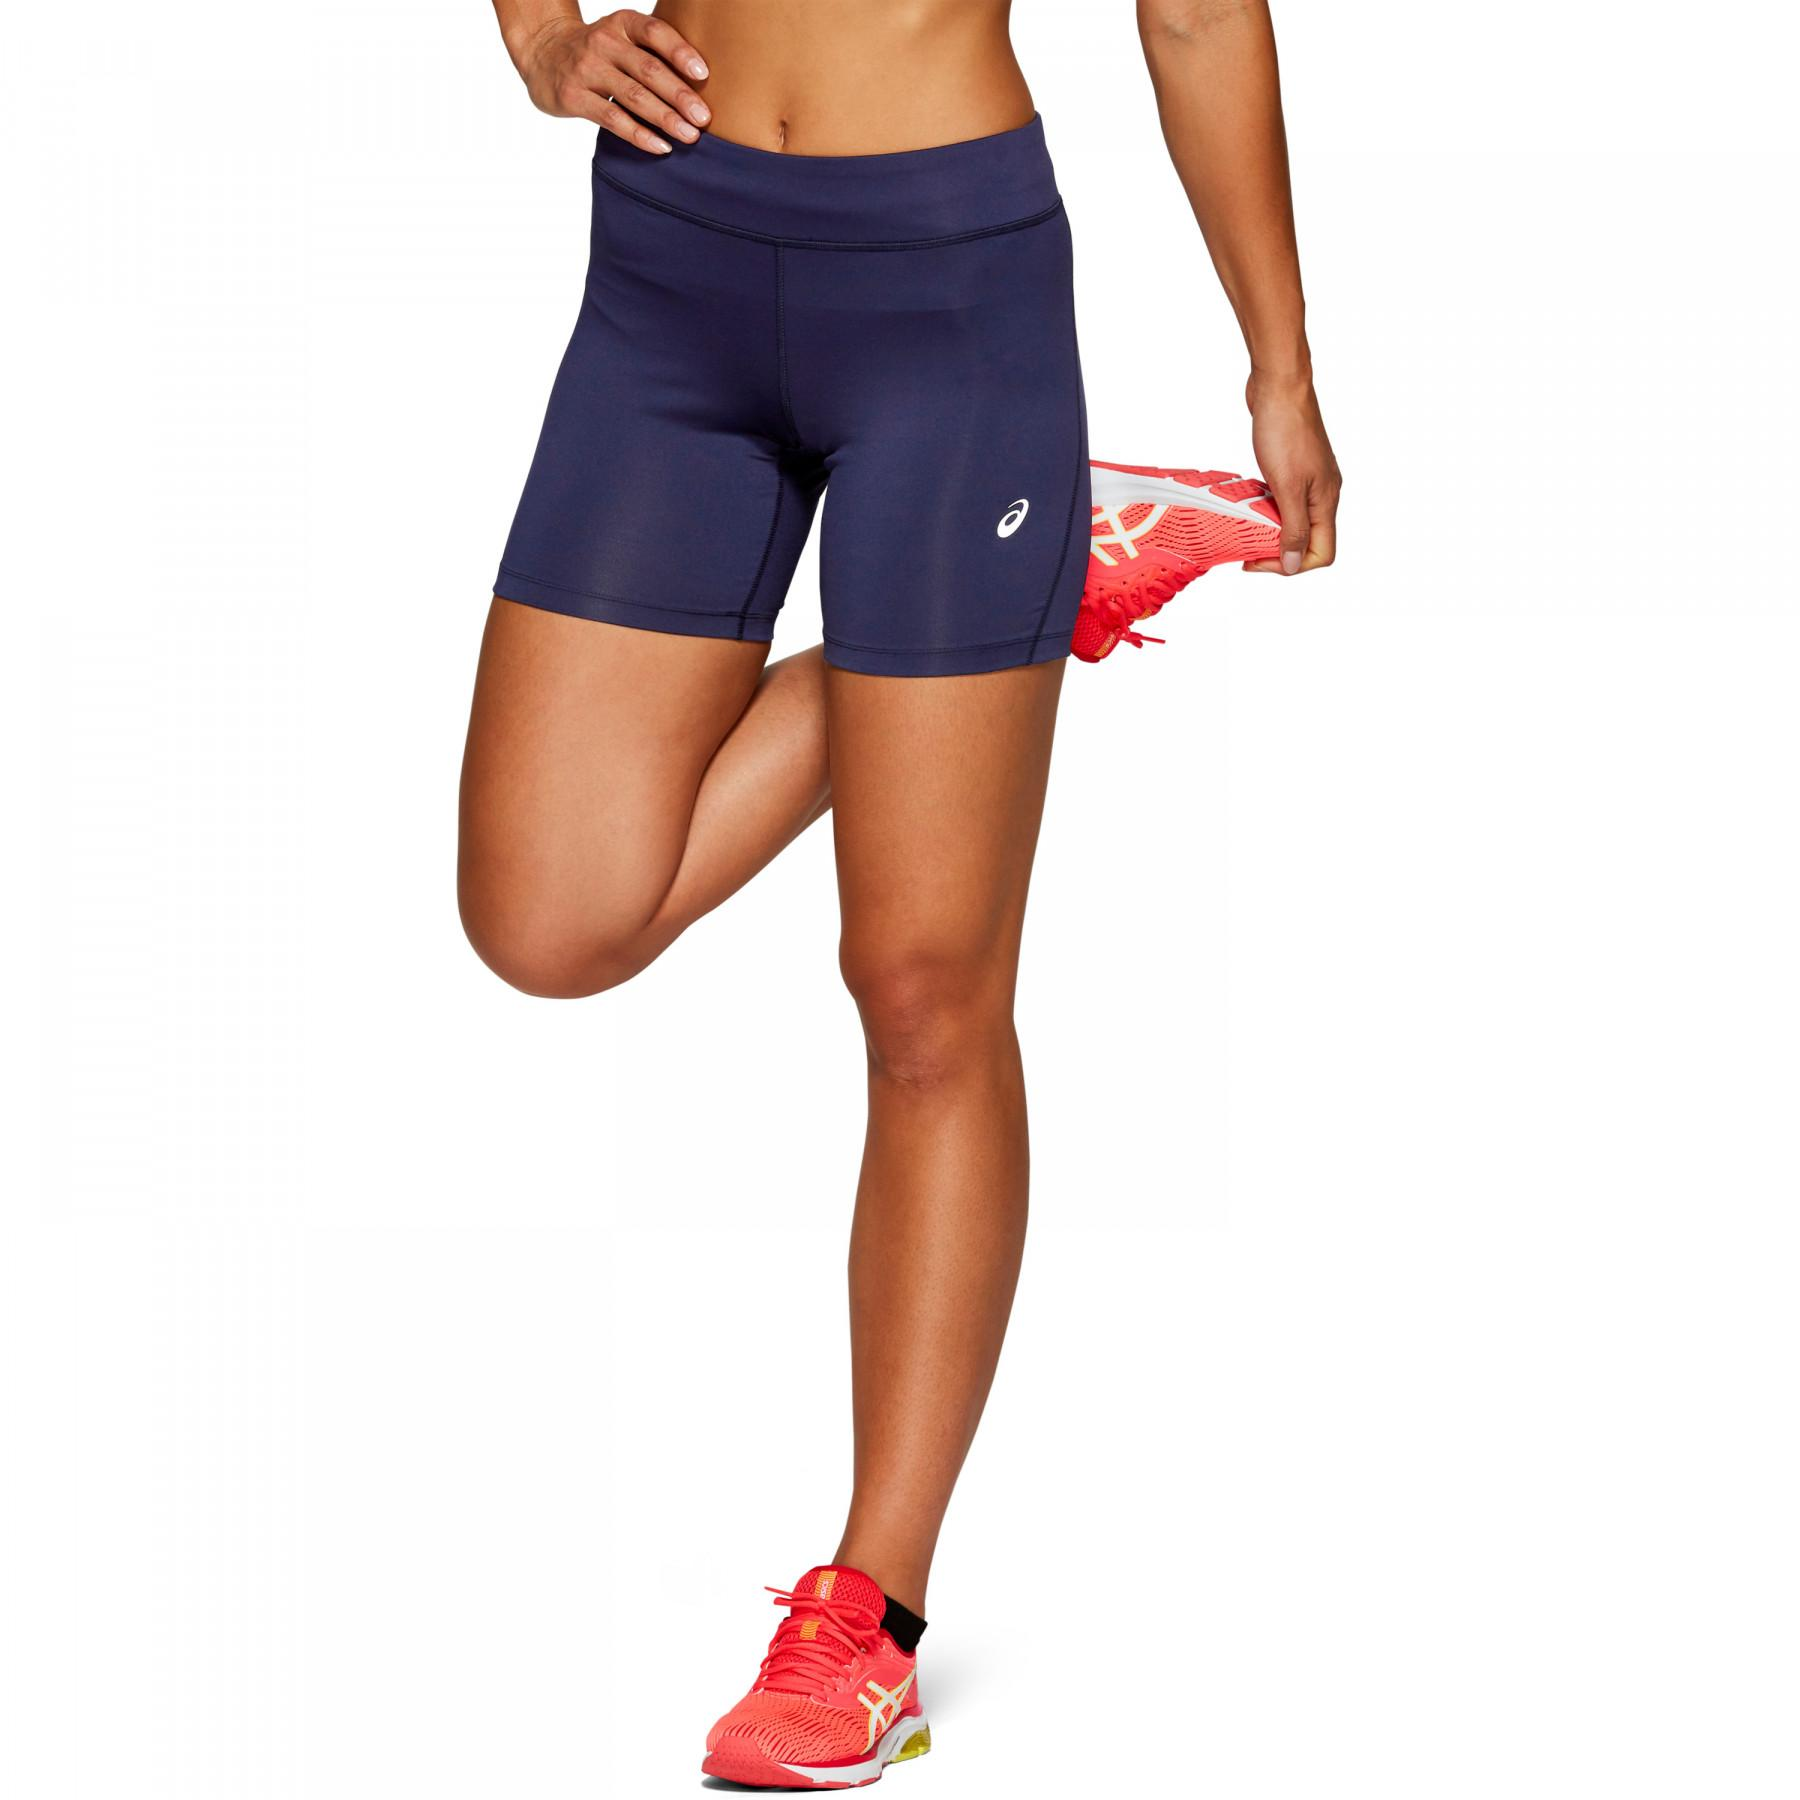 Women's compression shorts Asics Sprinter